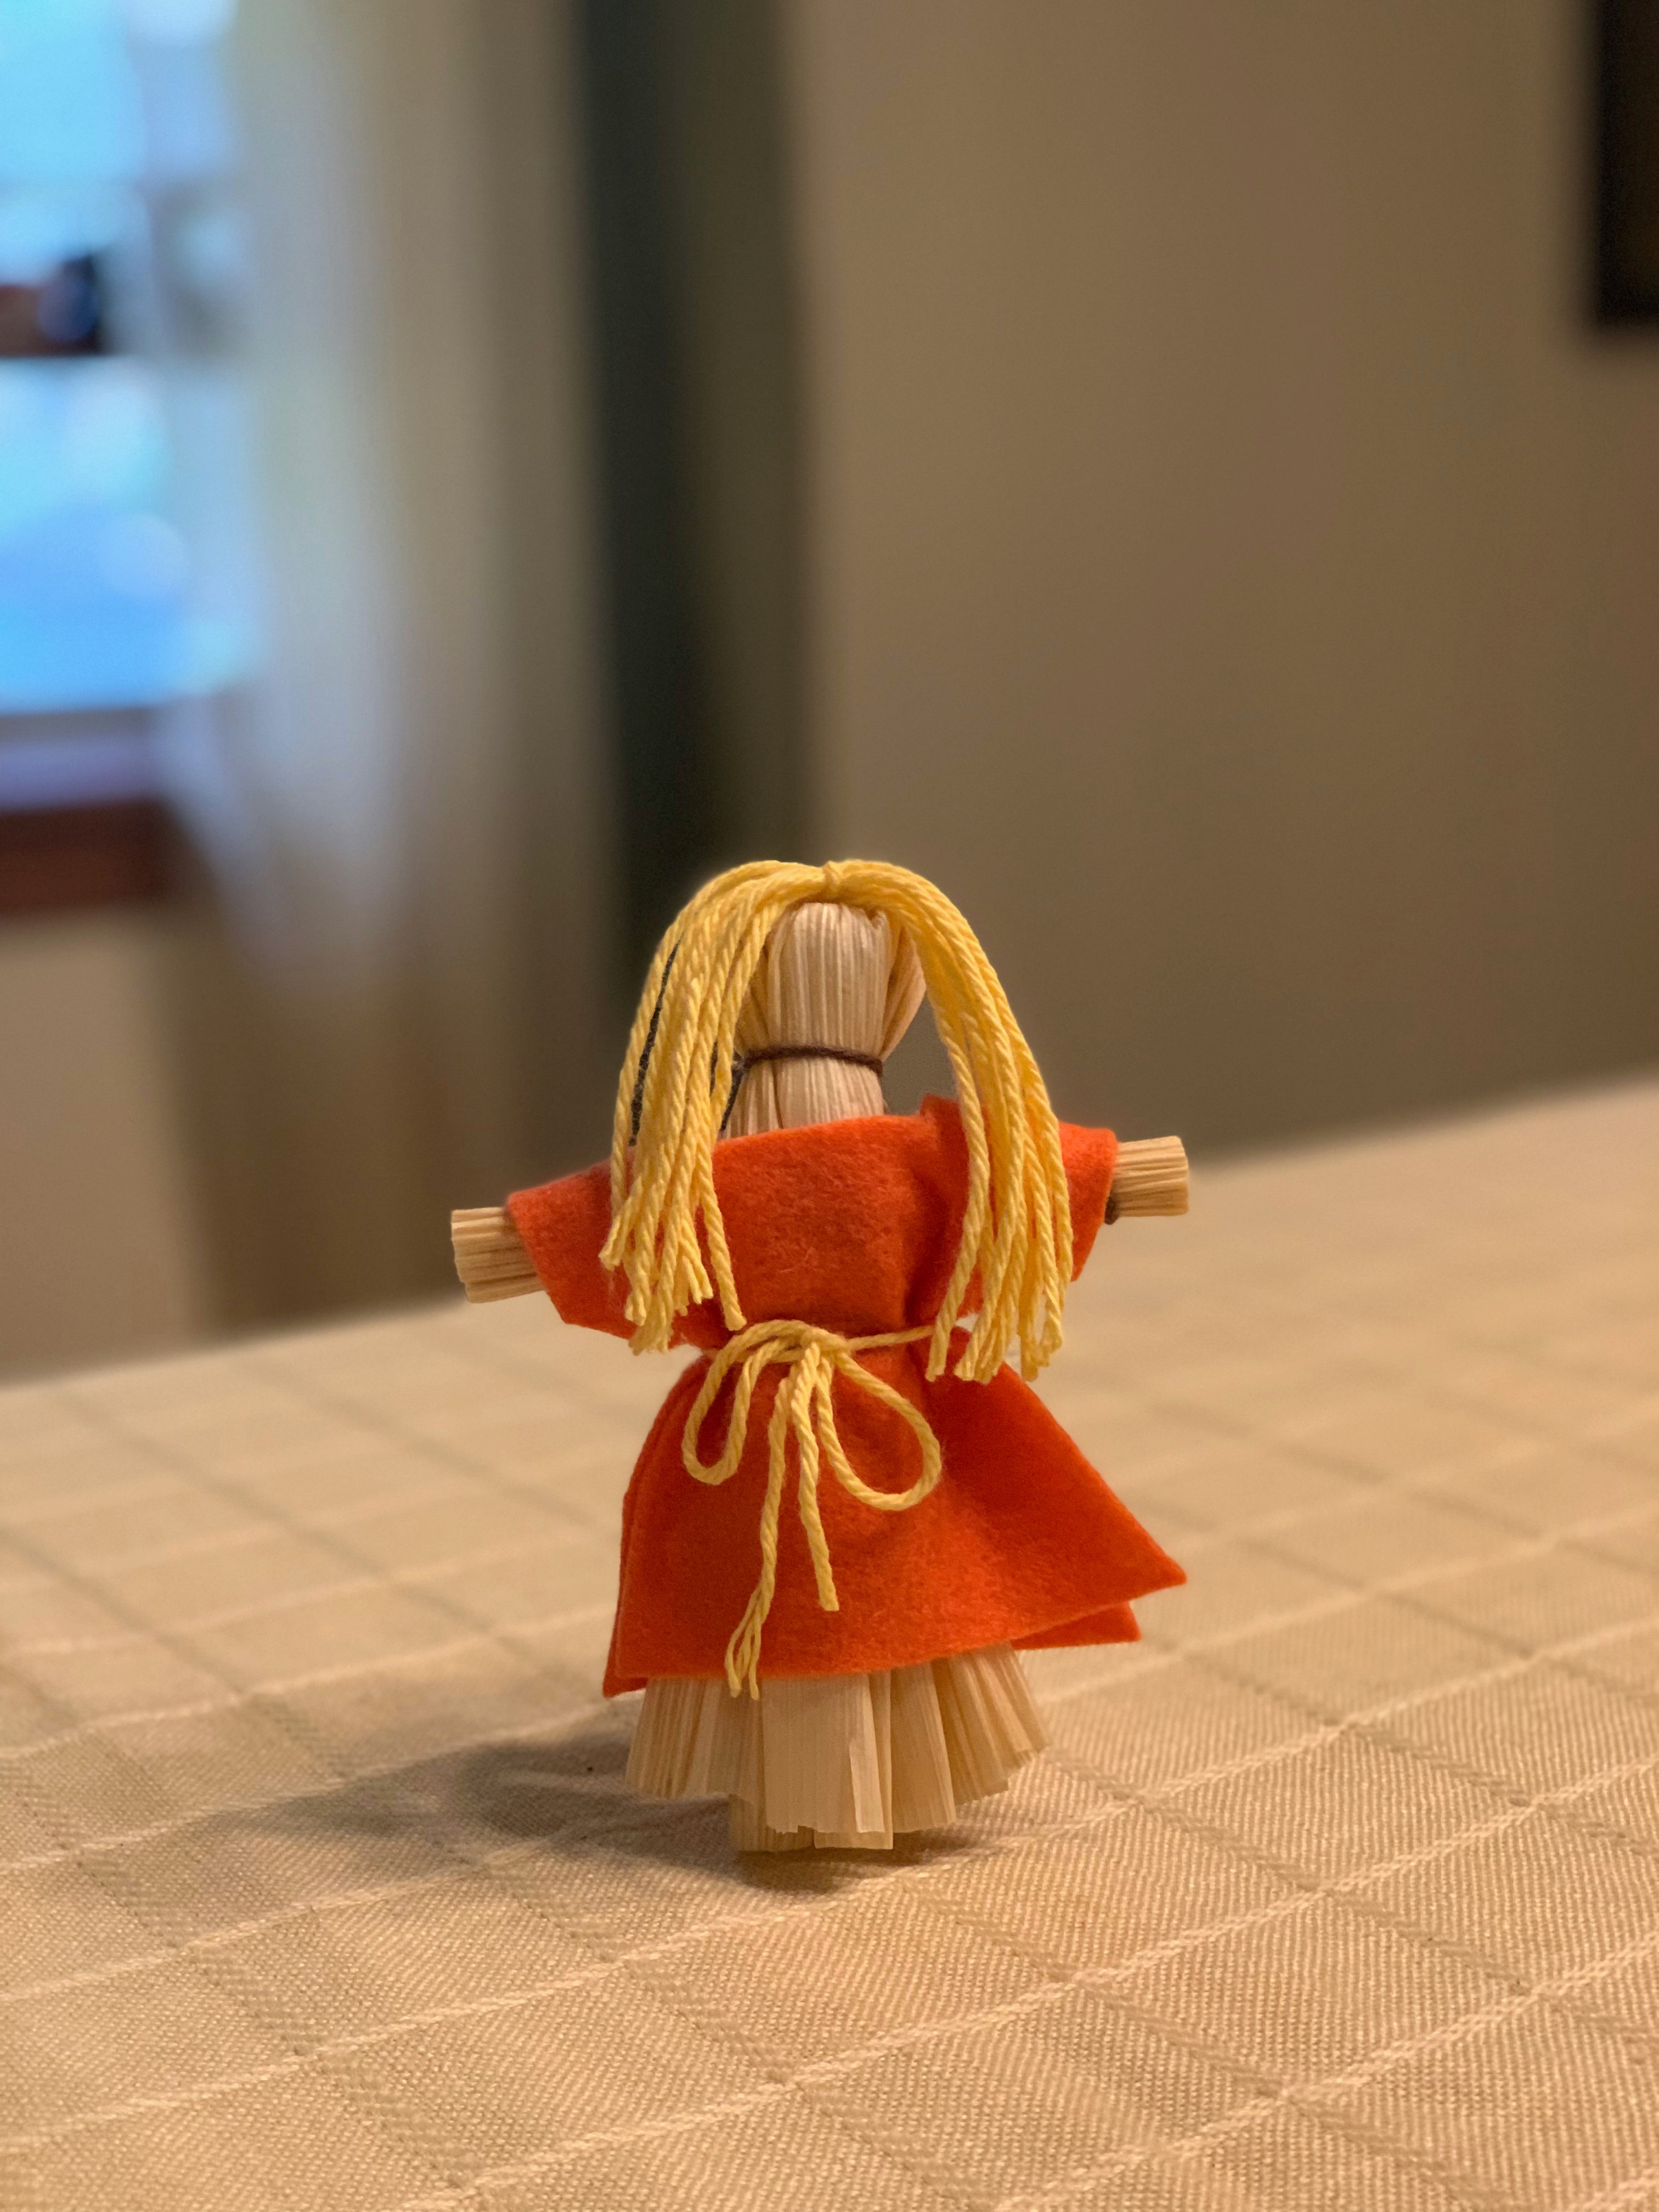 how to make corn husk dolls